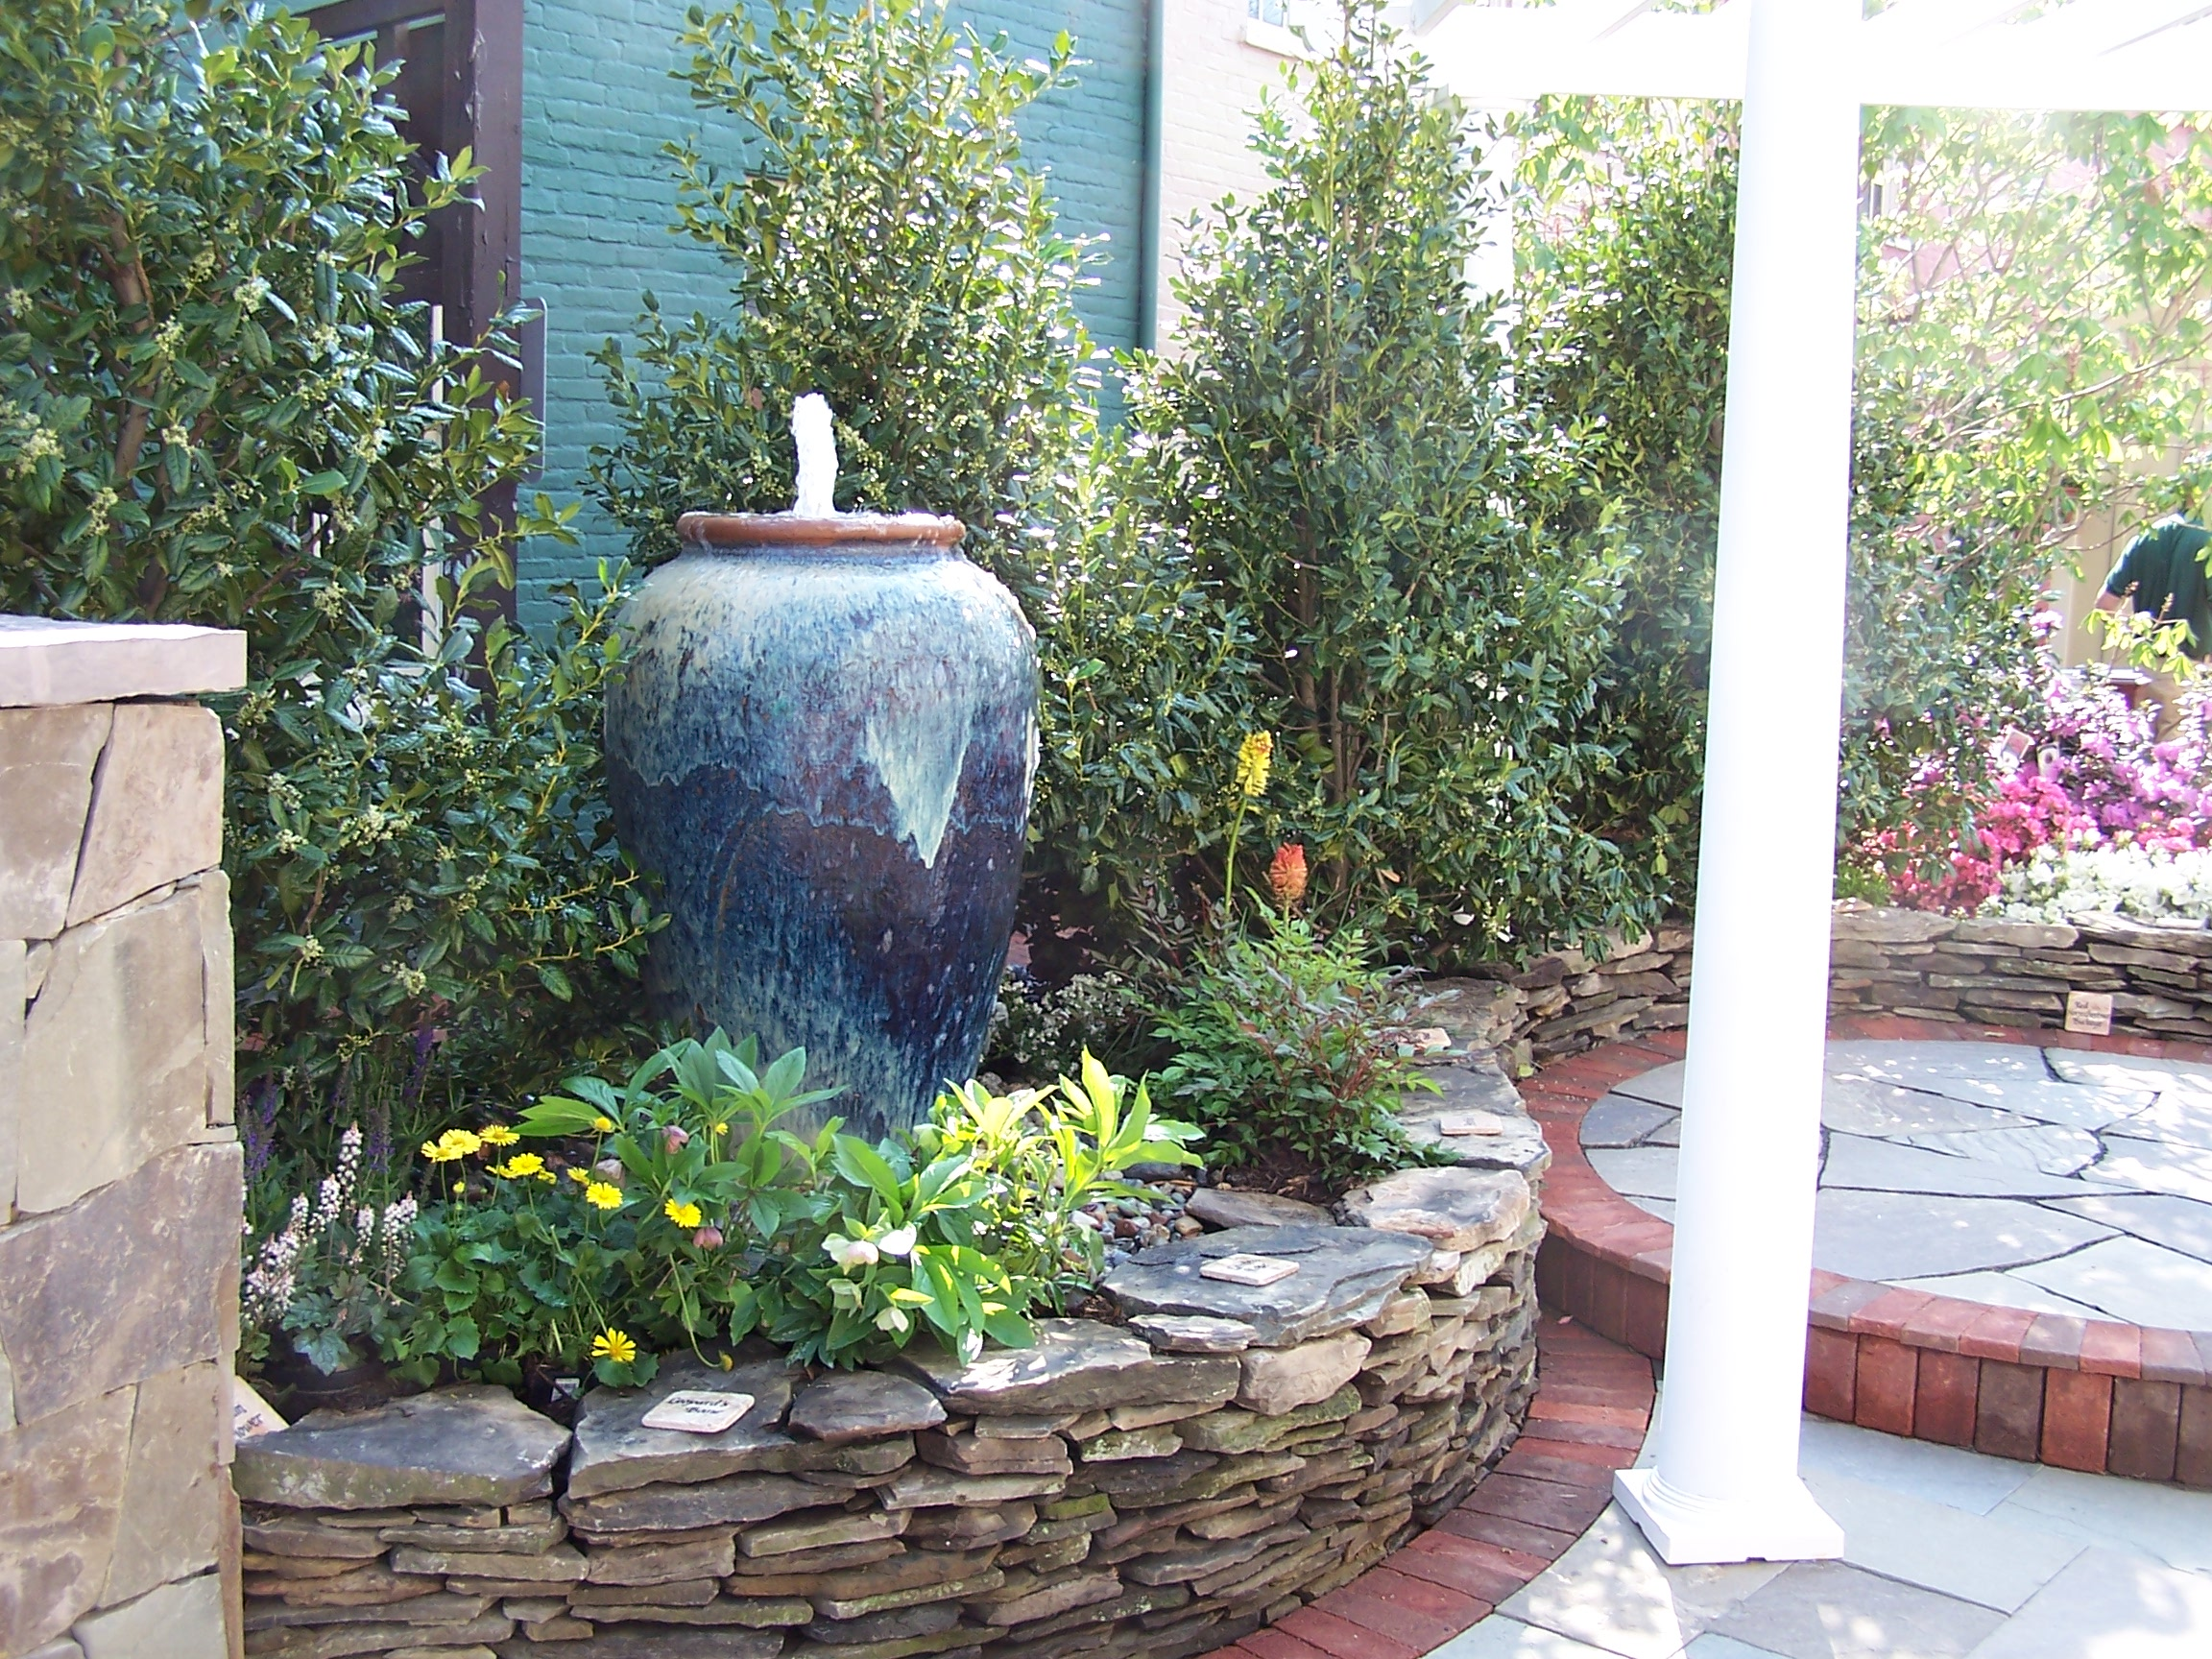 Water Gardens: Main Street Landscape